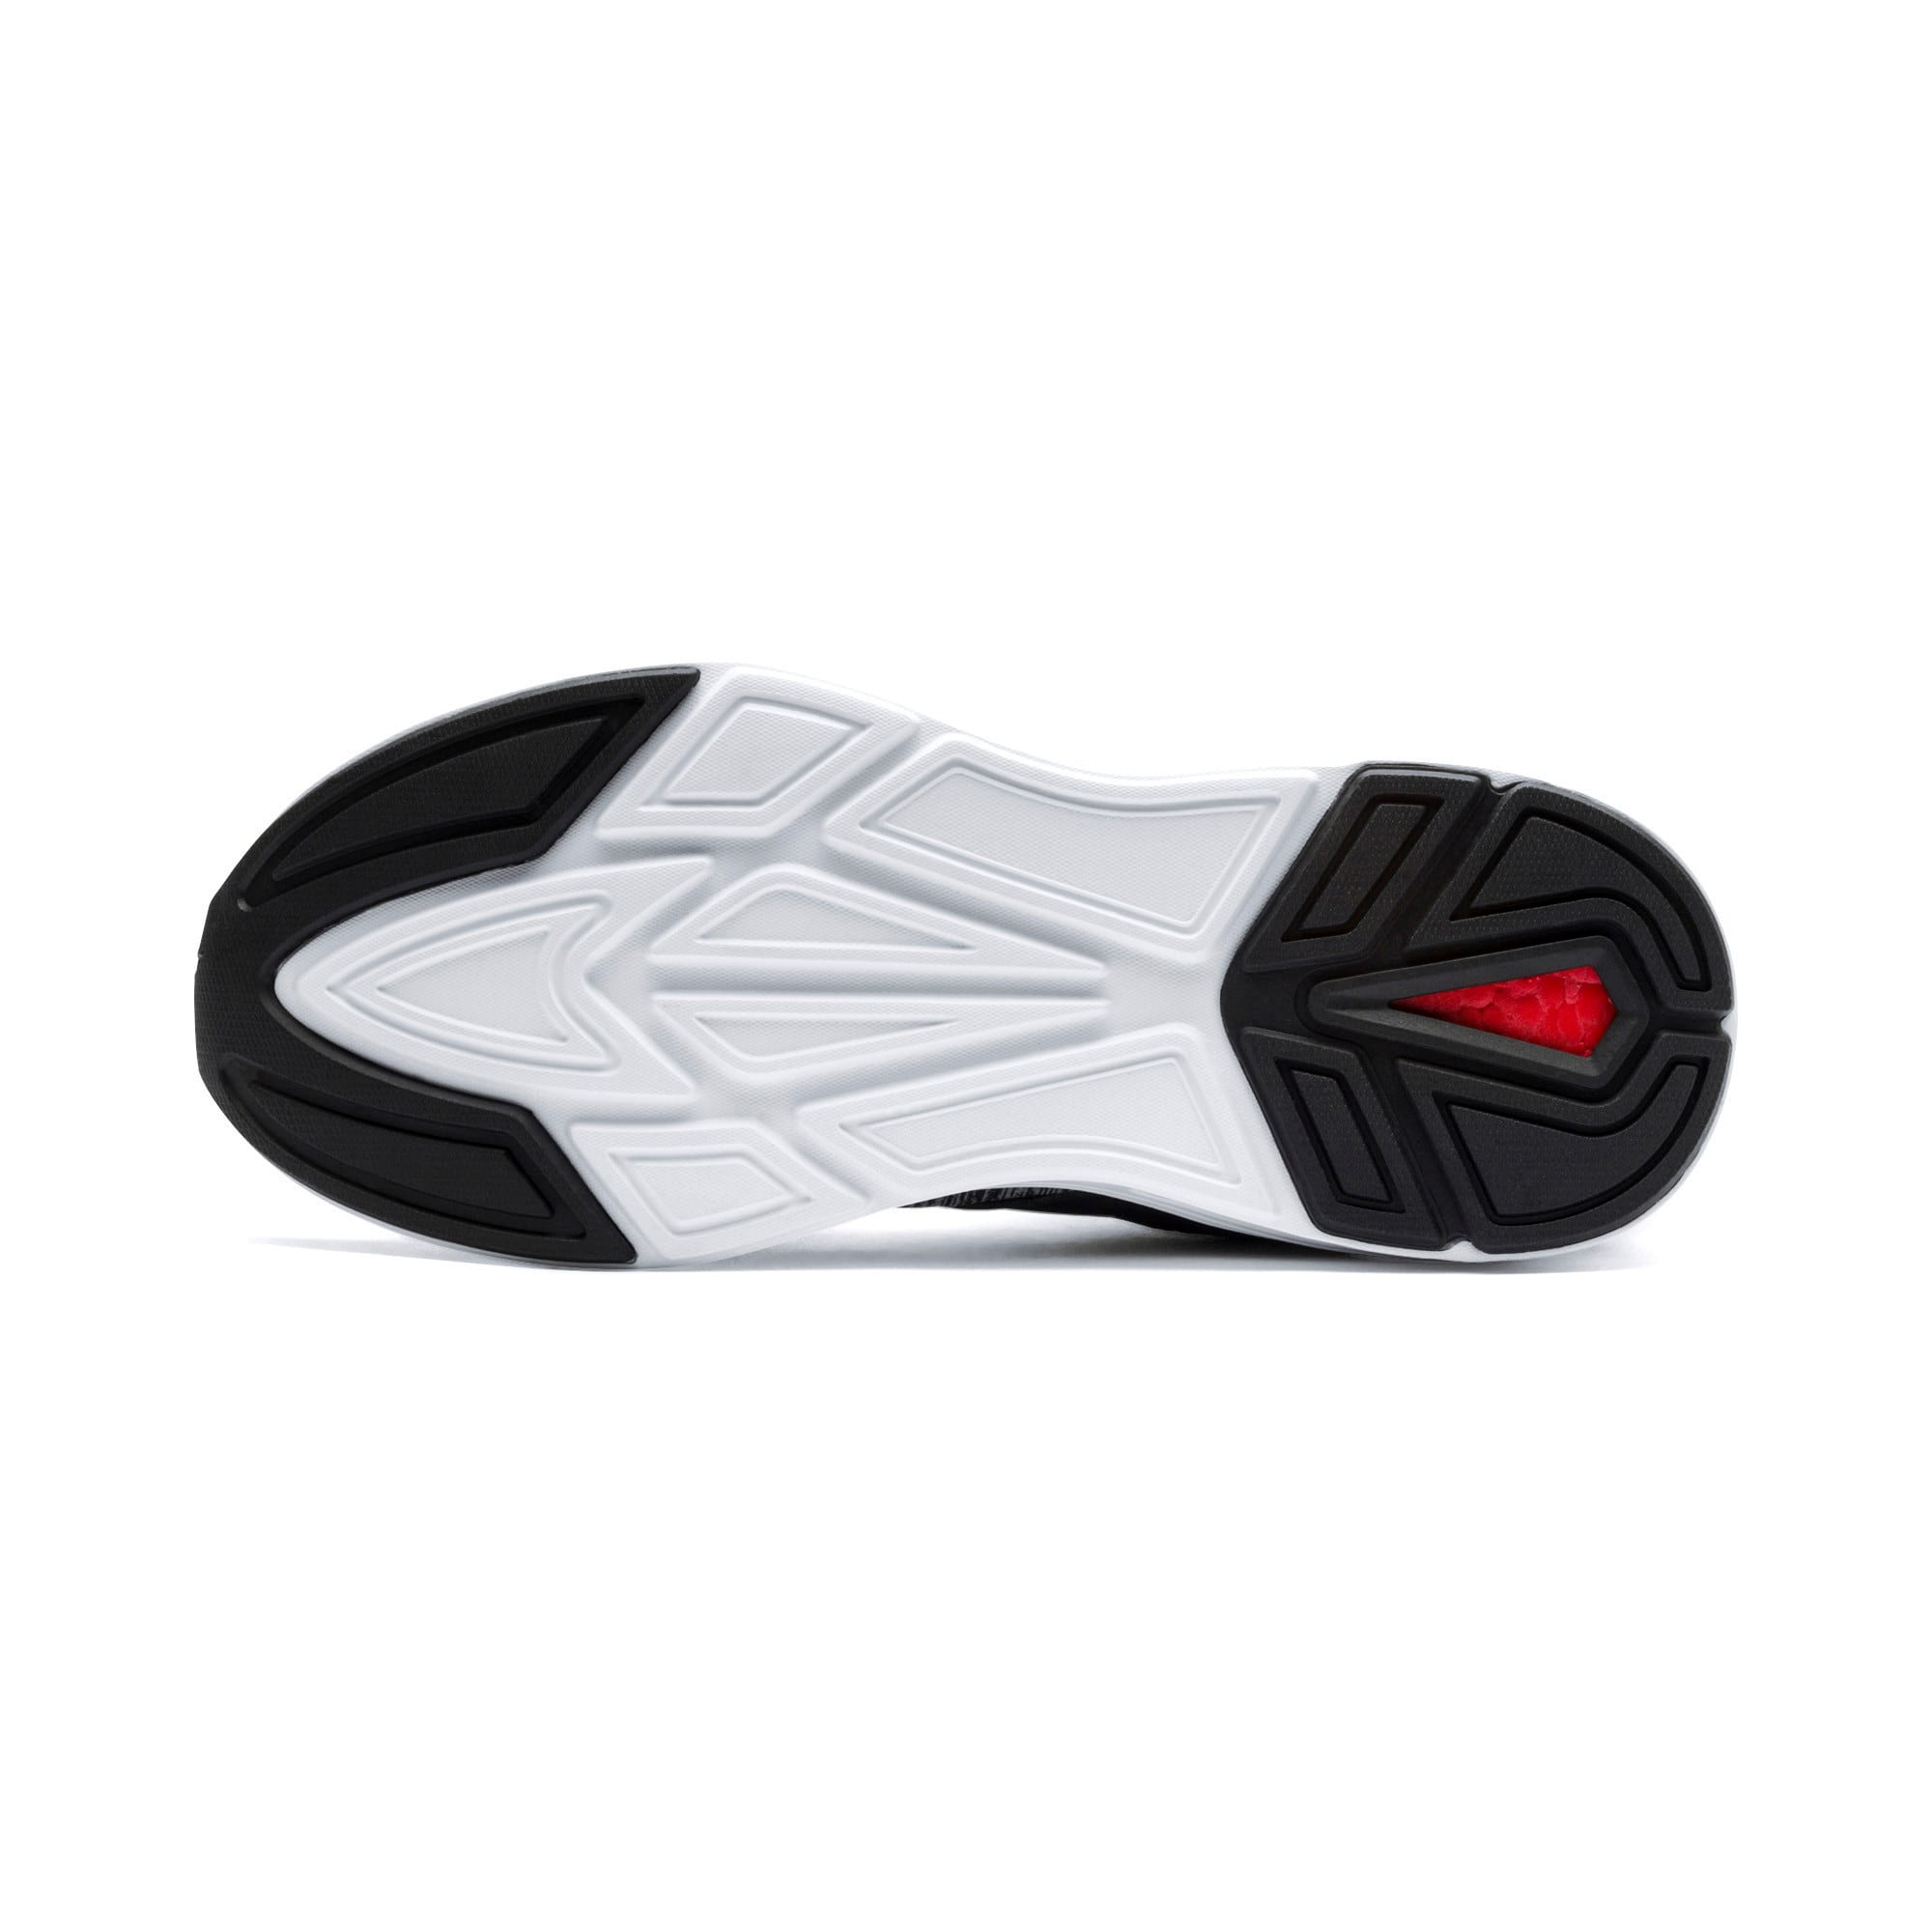 Thumbnail 5 of NRGY Comet Kids' Training Shoes, Puma White-Puma Black, medium-IND